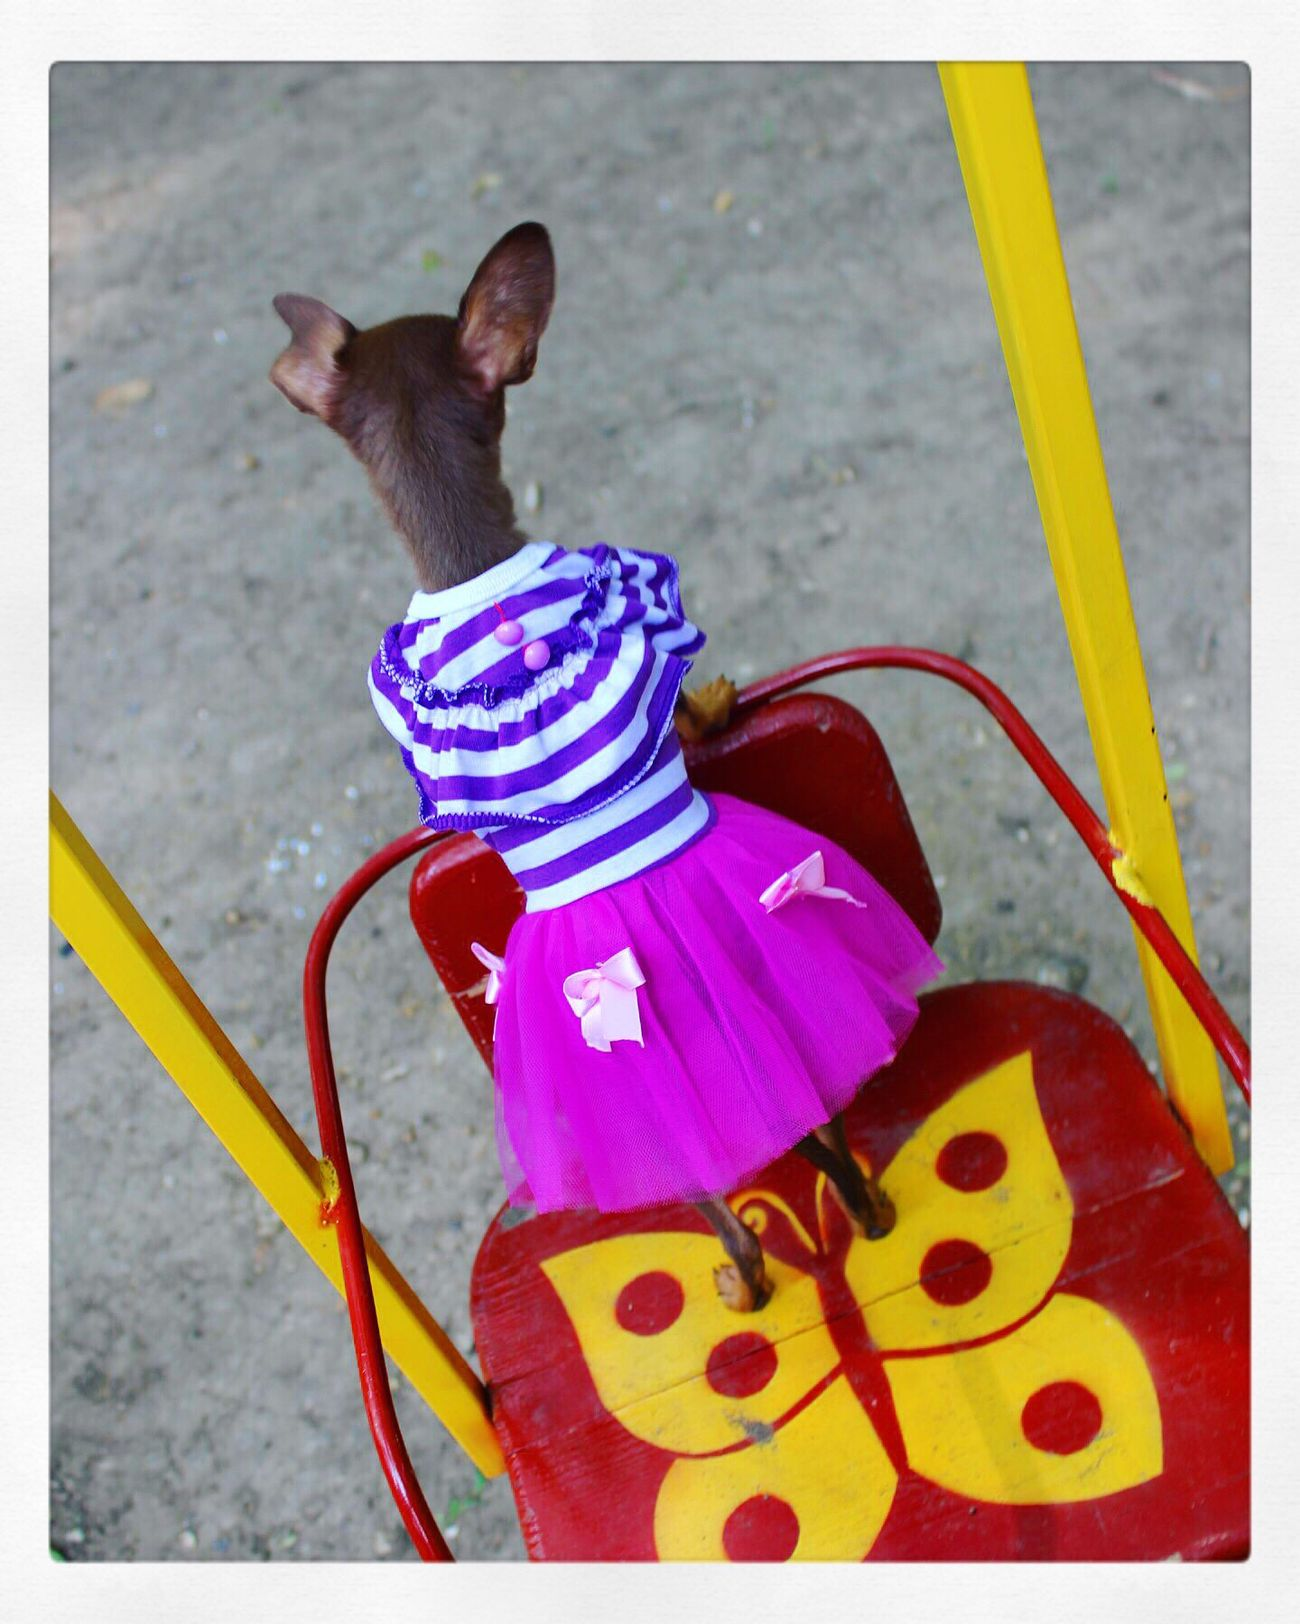 Позируем и заодно катаемся Russiantoy Russiantoyterrier Russiantoyterier Littlepuppy Fashiondog Littledress Dress Fashion Тойчик Butterfly бабочка